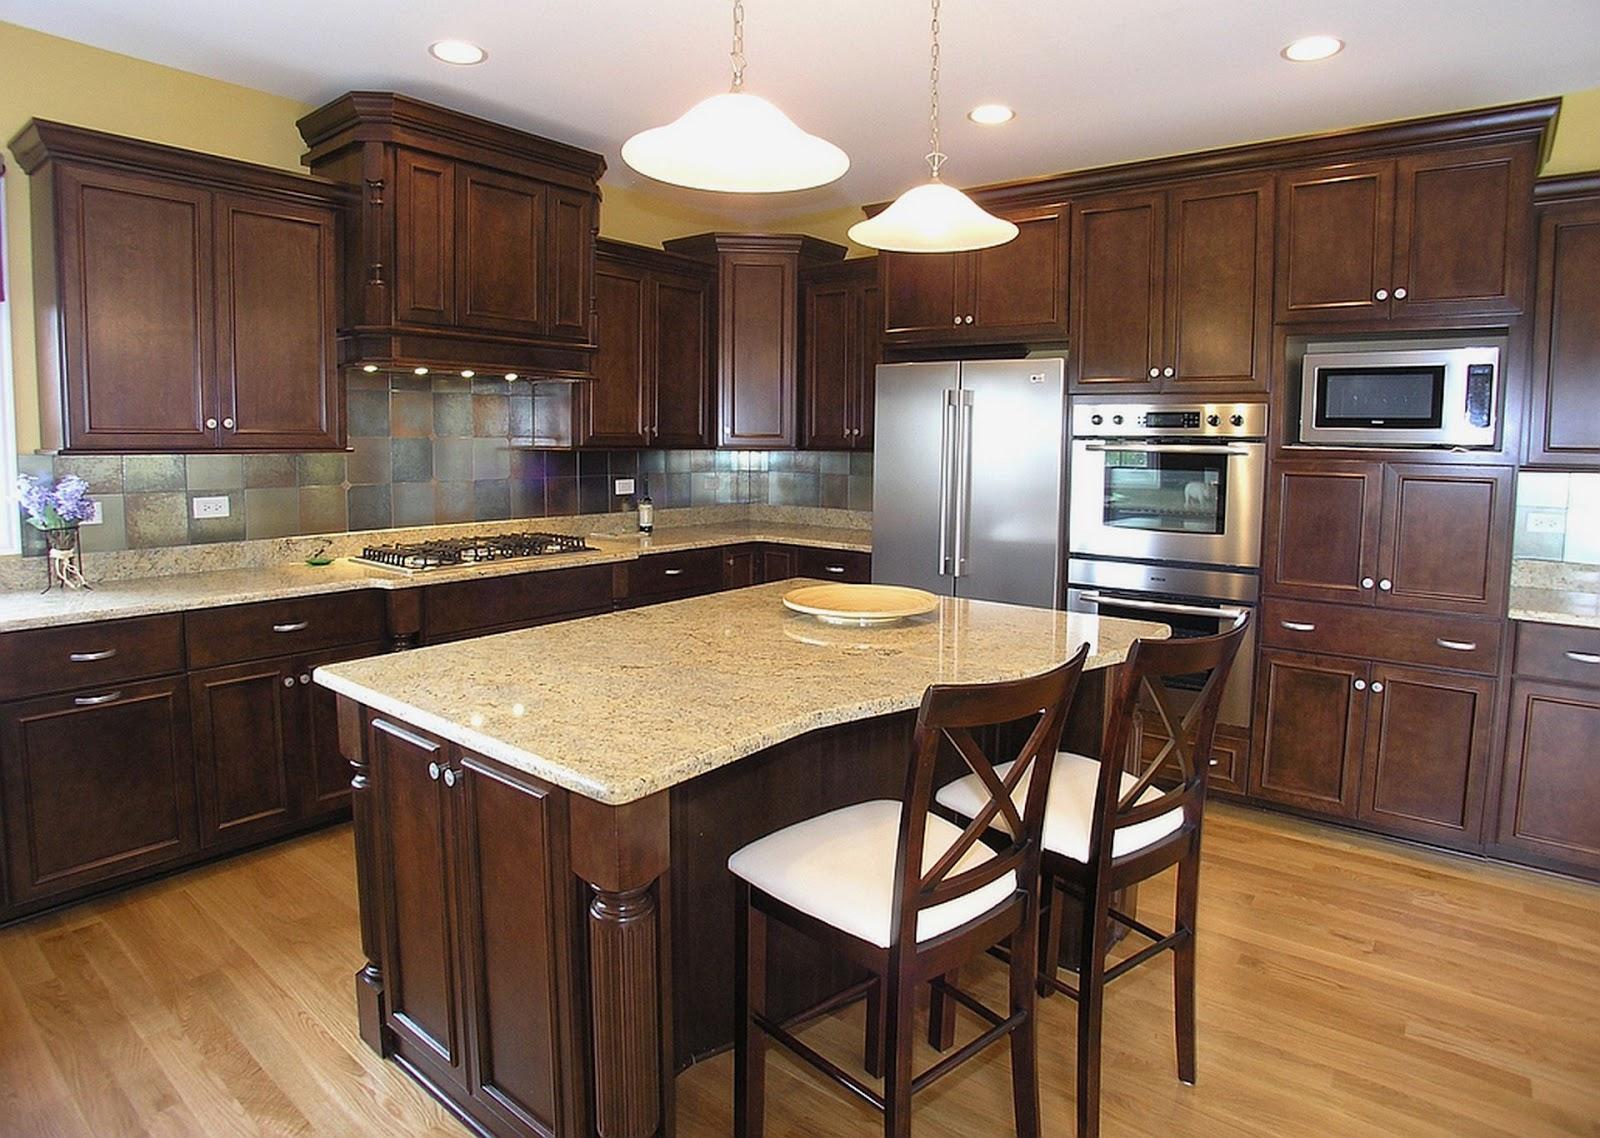 wood kitchen floors best range flooring silverspikestudio